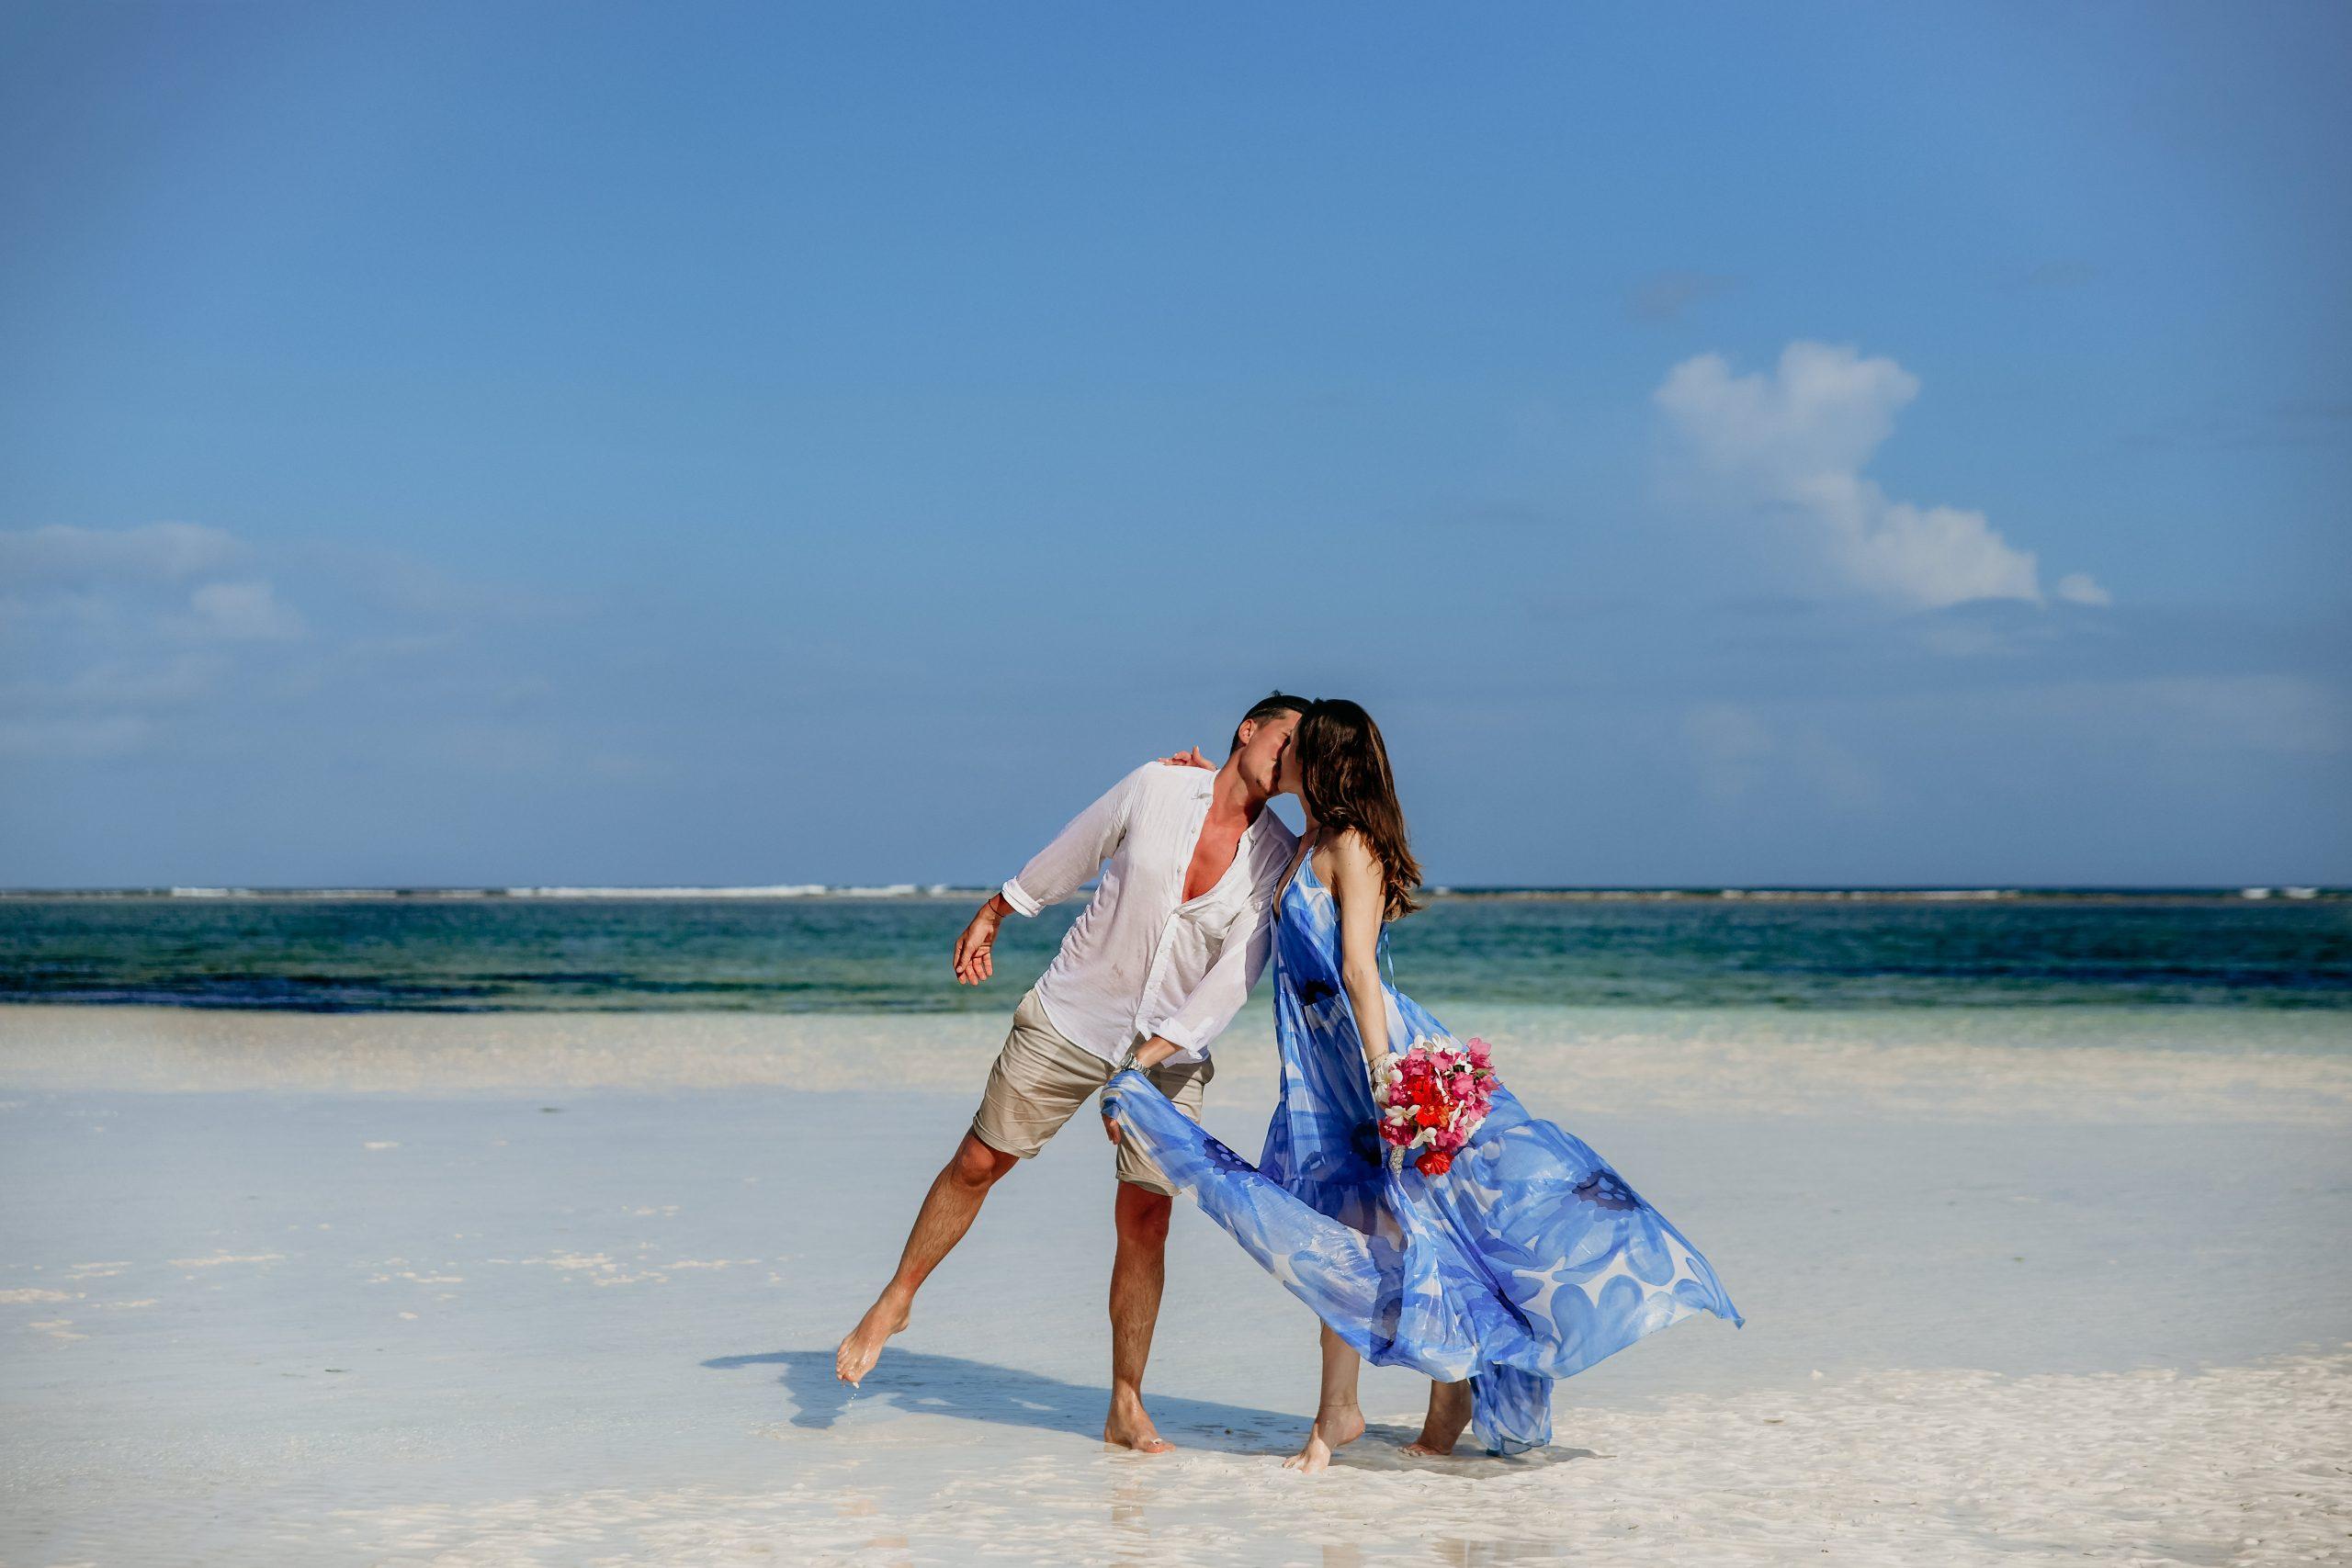 Fotografie de nunta in Zanzibar, Ședință foto pe plajă in Zanzibar